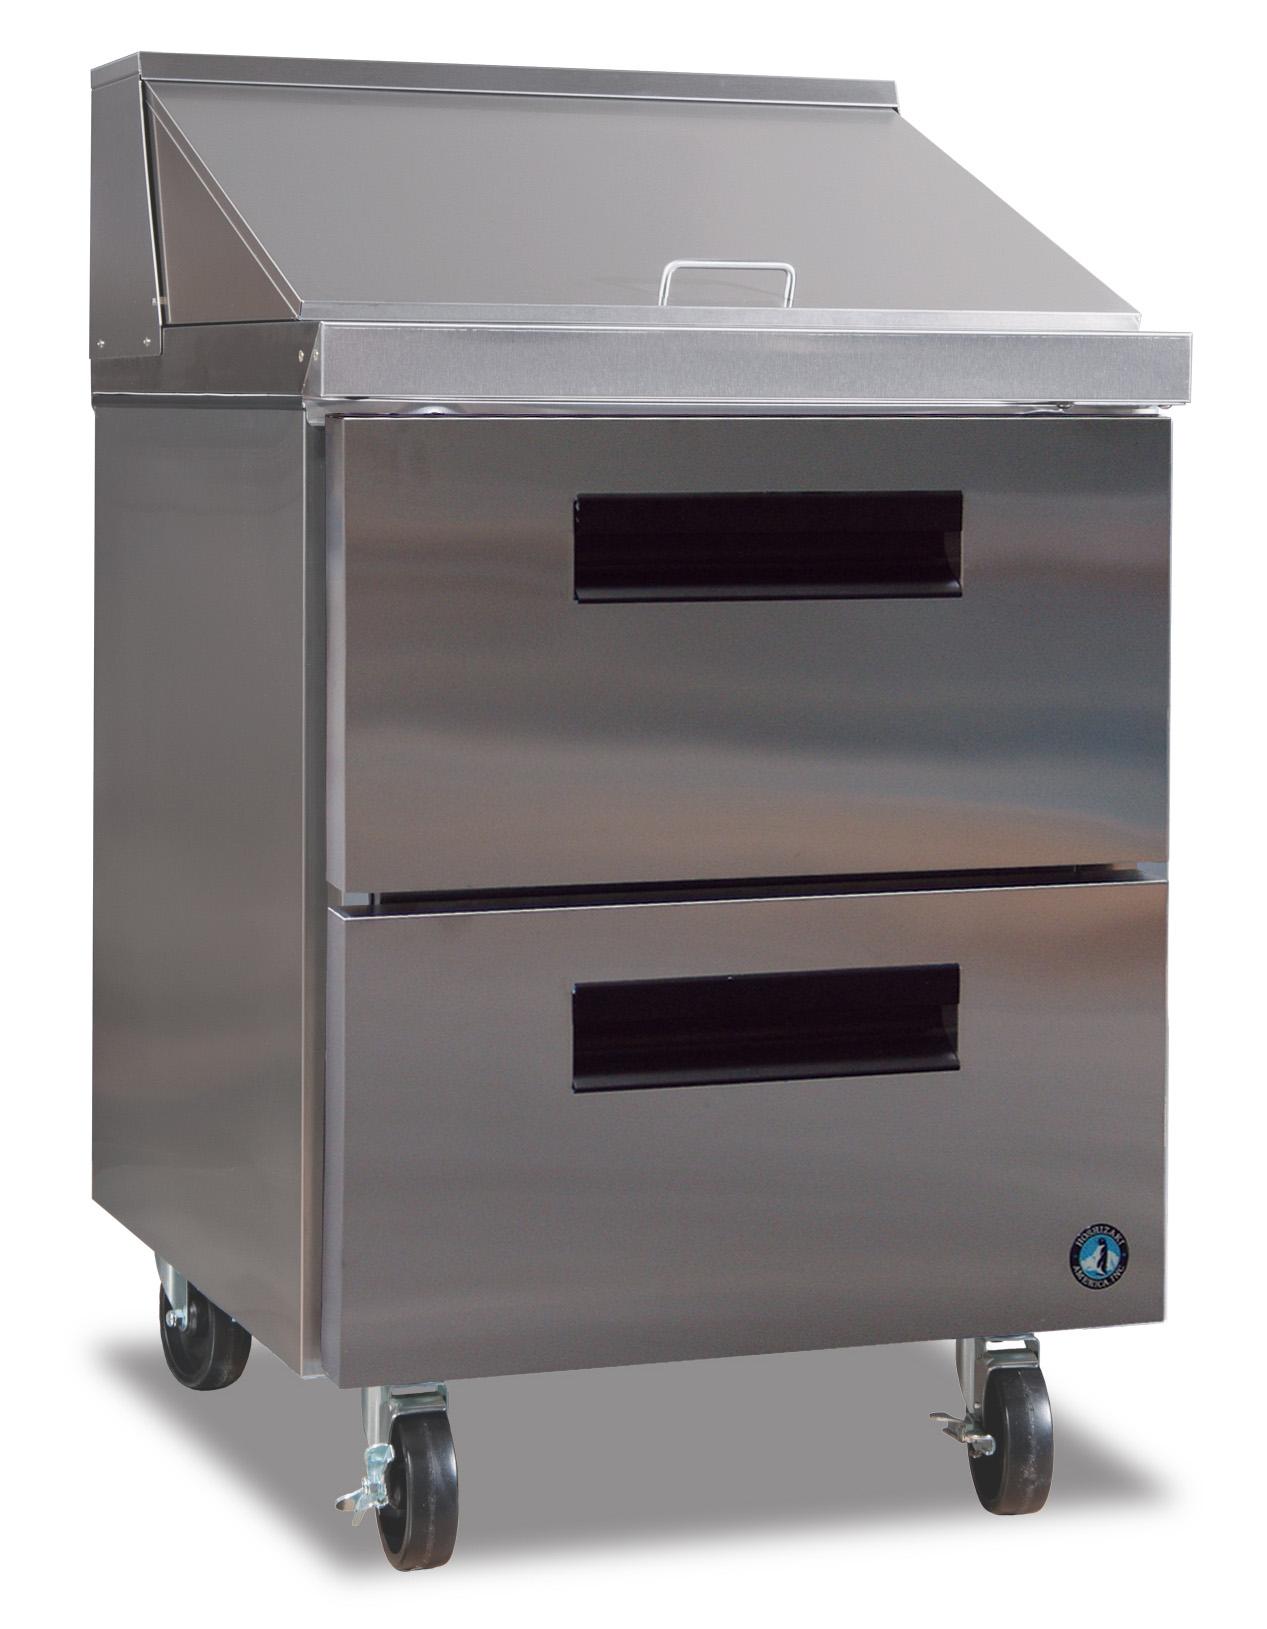 air door designs refrigerator drawer product kenmore single